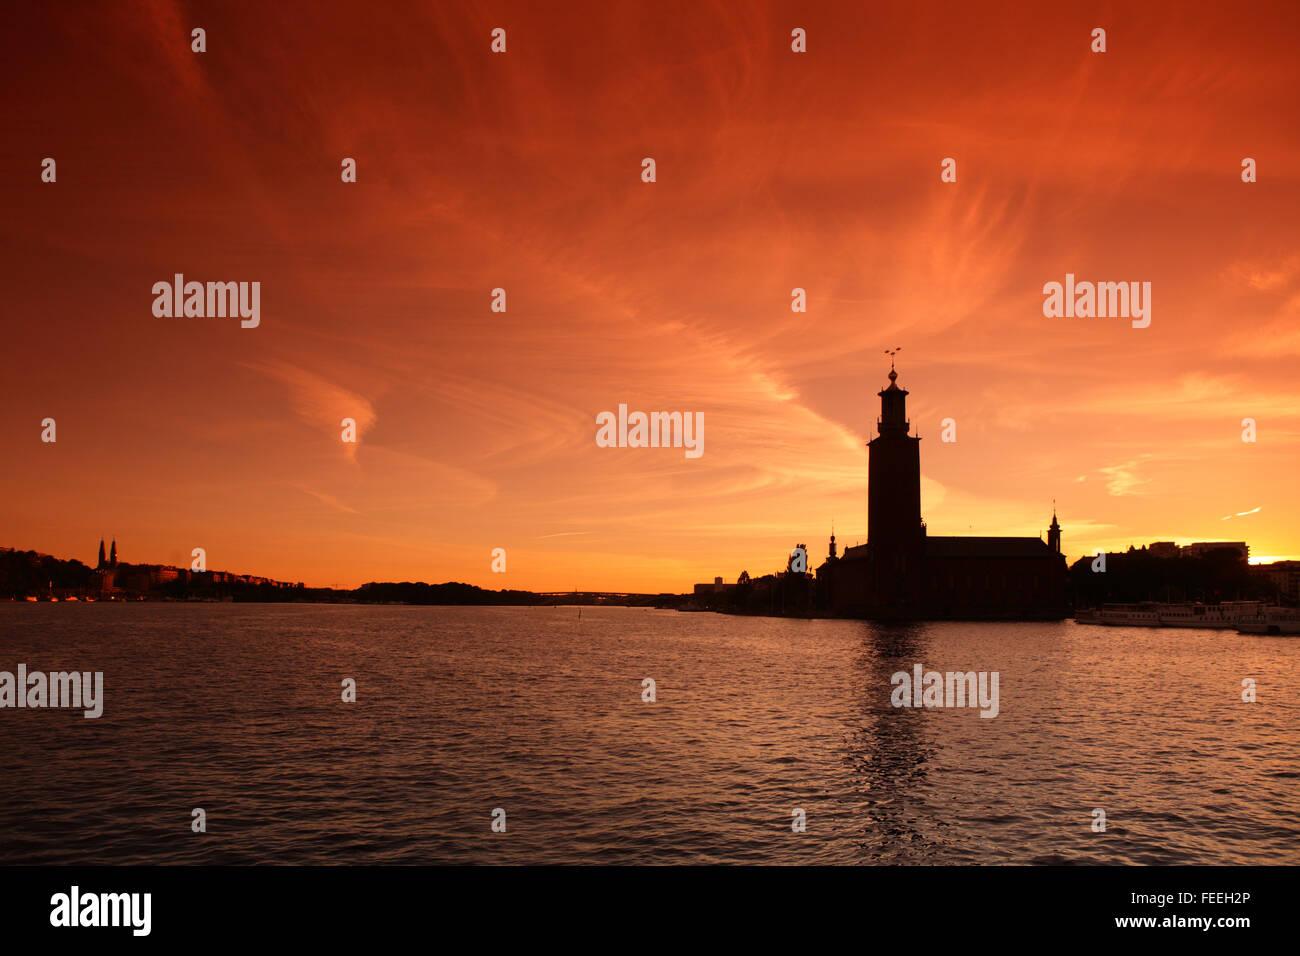 Stockholm City Hall at sunset, Sweden - Stock Image